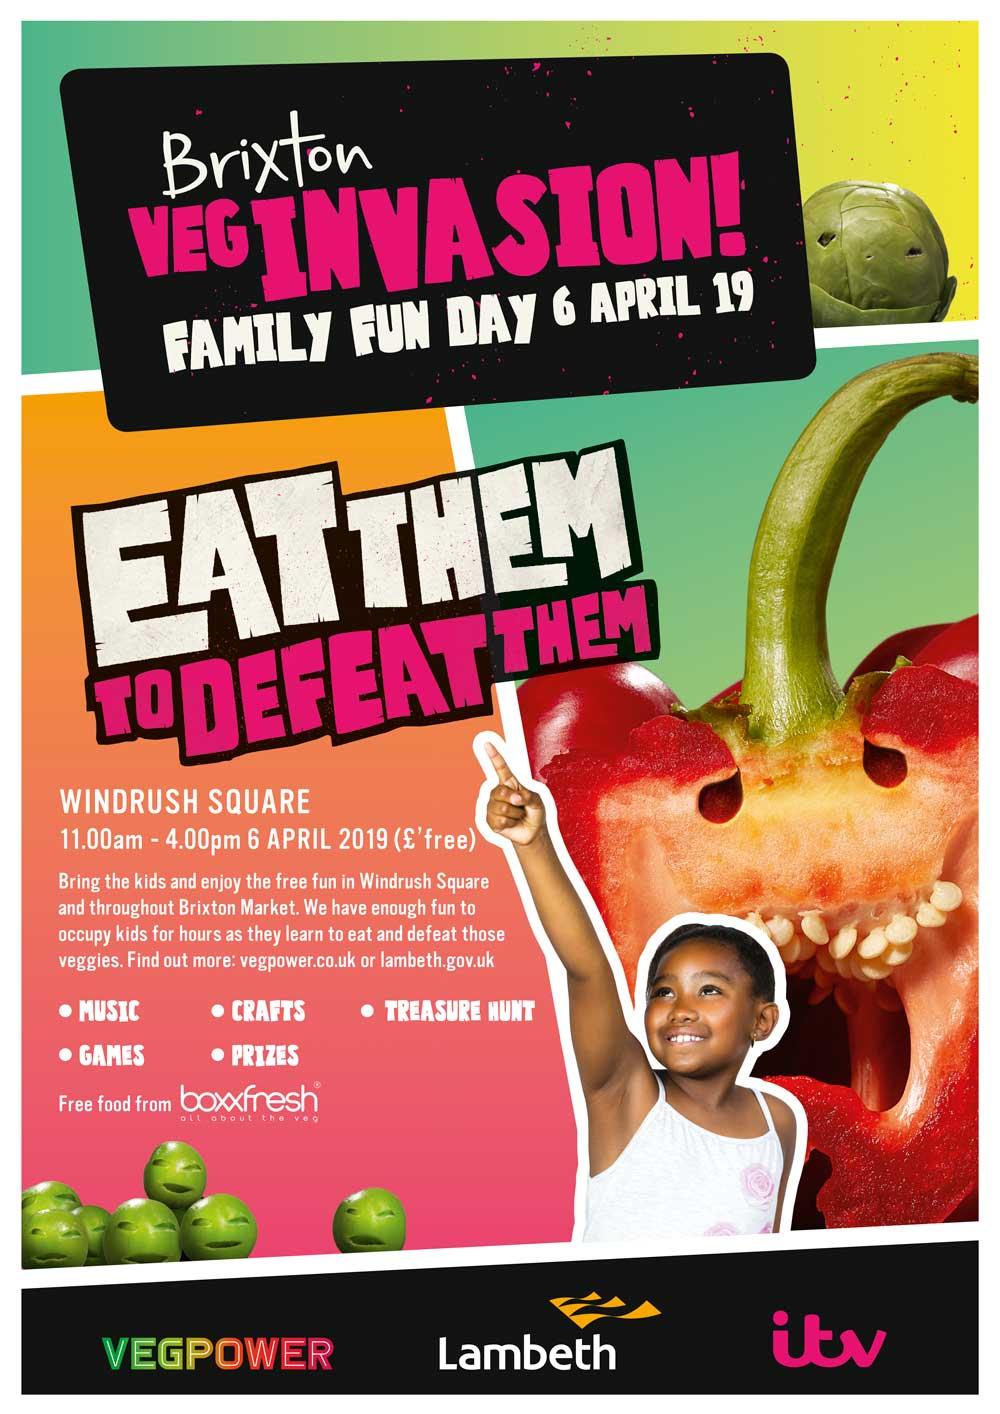 Poster for Veg Invasion family fun day 6 April Windrush Square